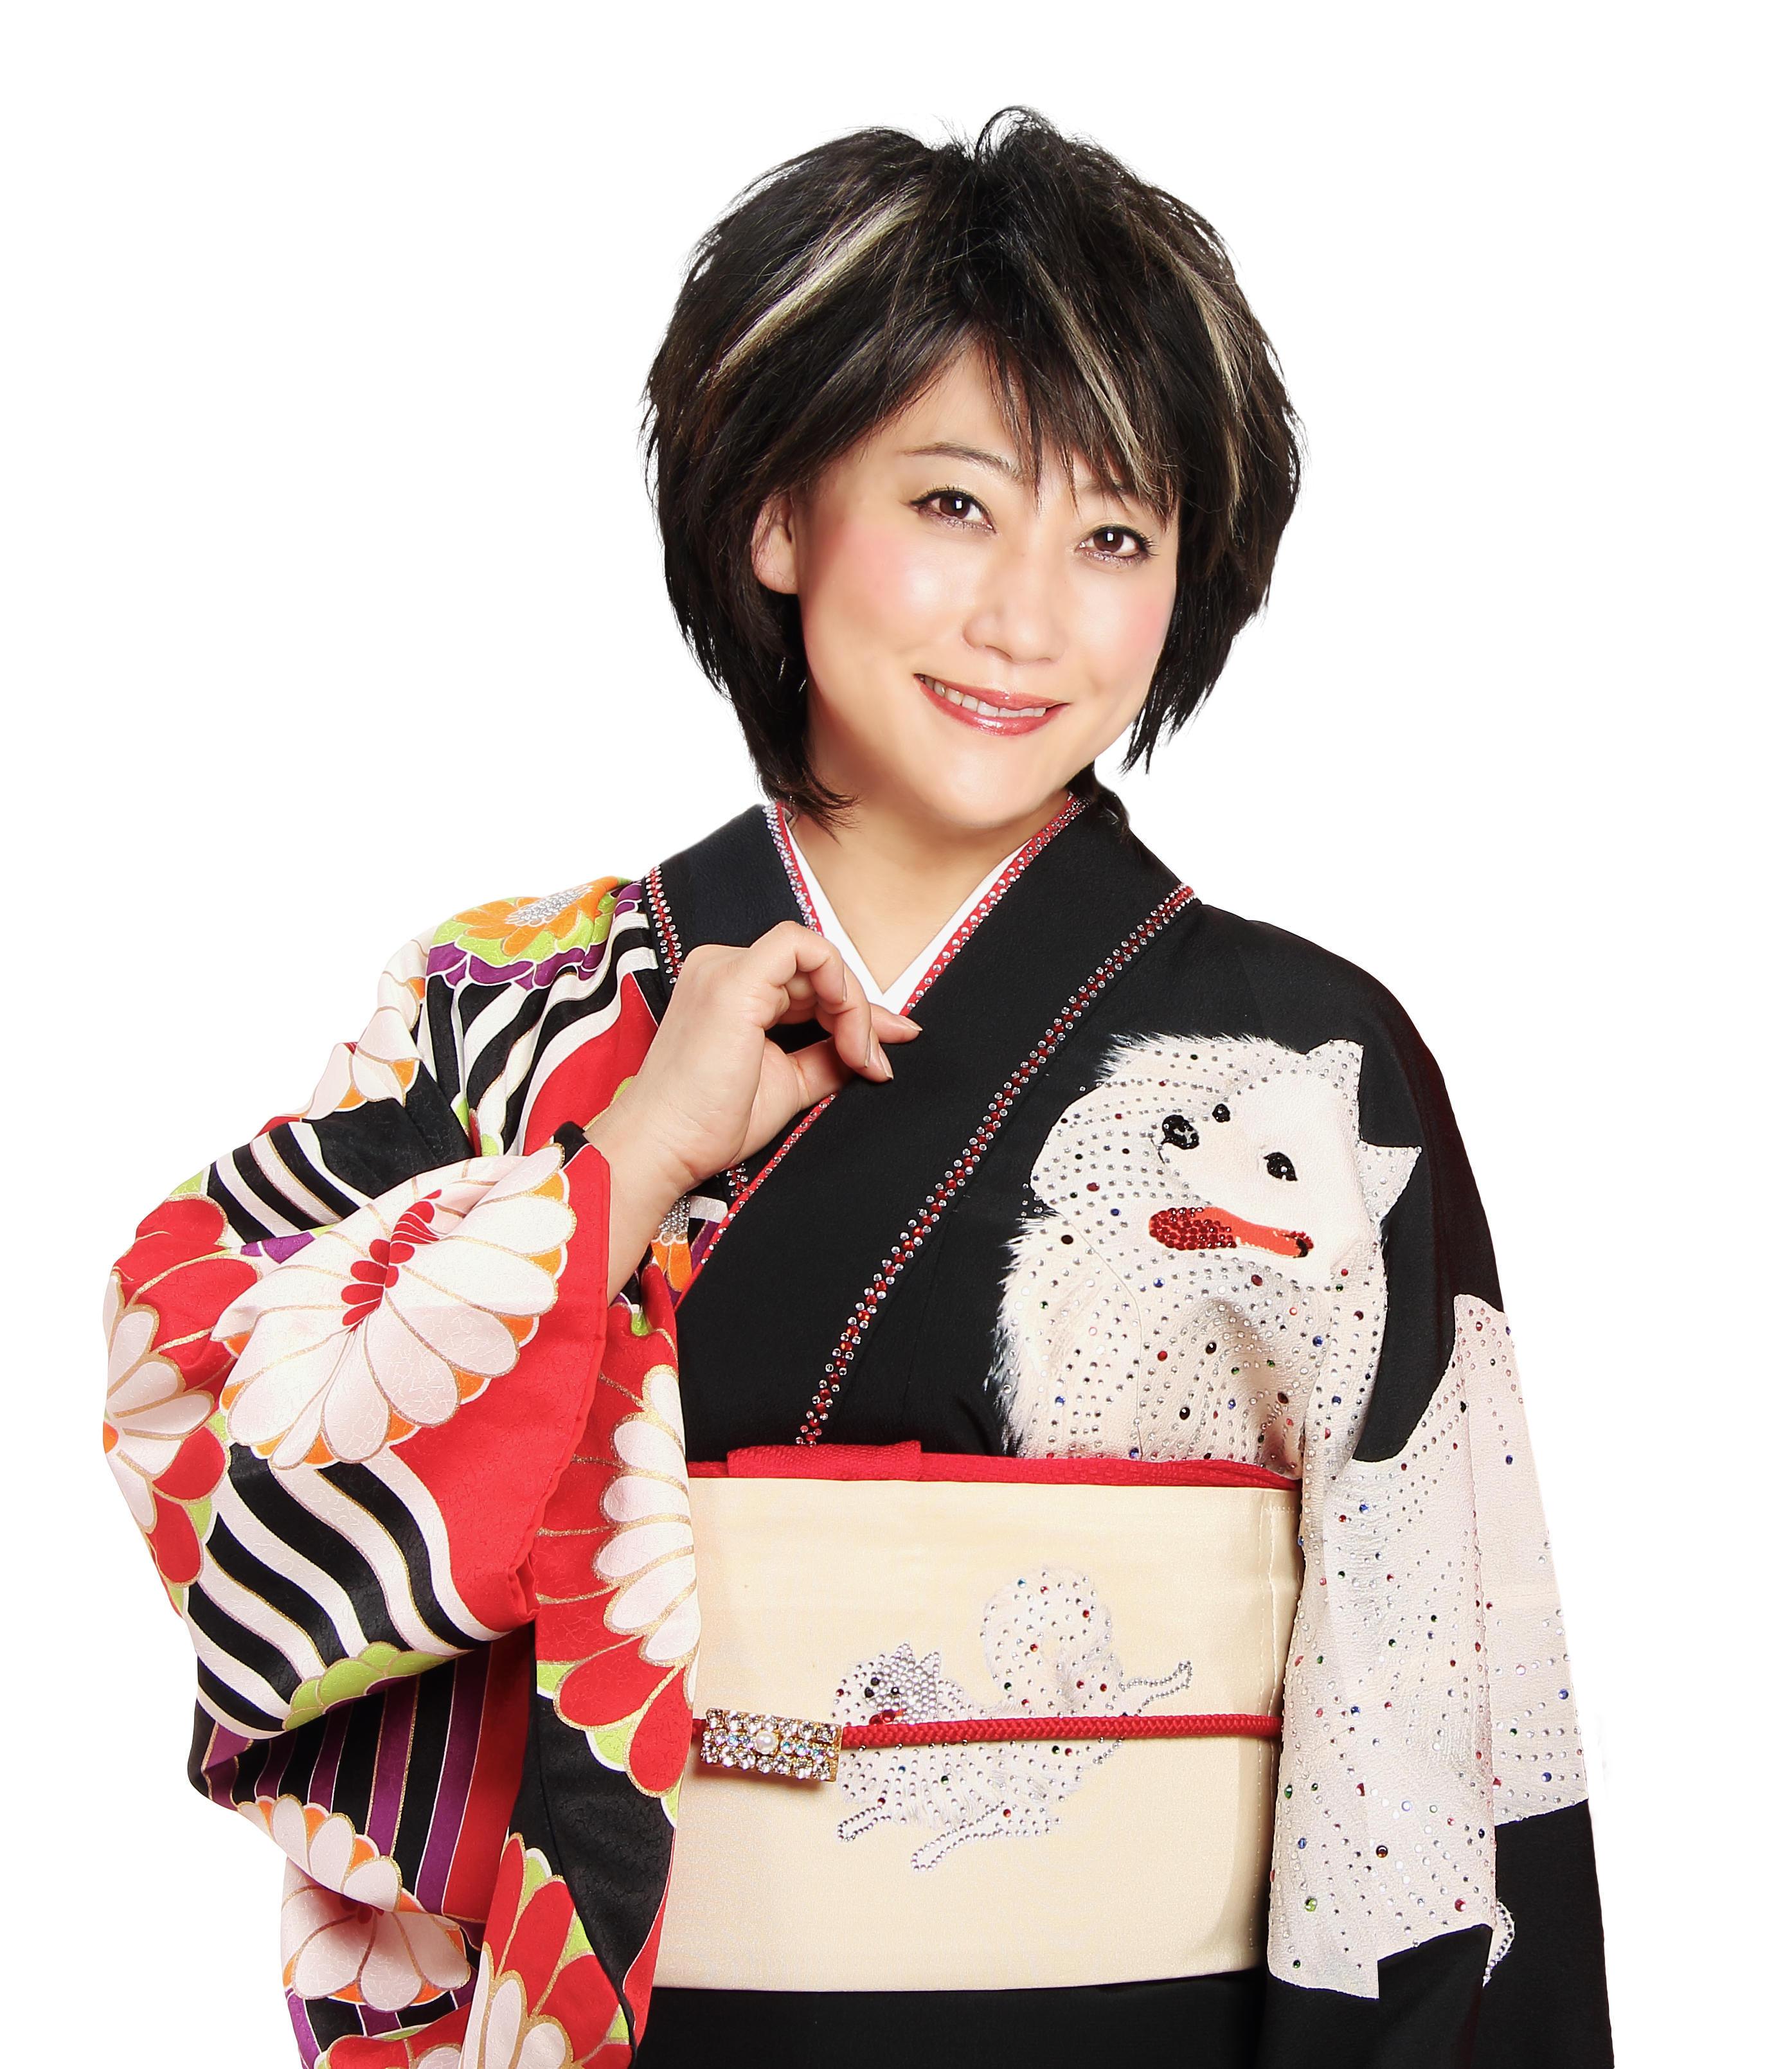 http://news.yoshimoto.co.jp/20170919182604-2f9cf13506da49c66bef82a56eab36cd846f7362.jpg